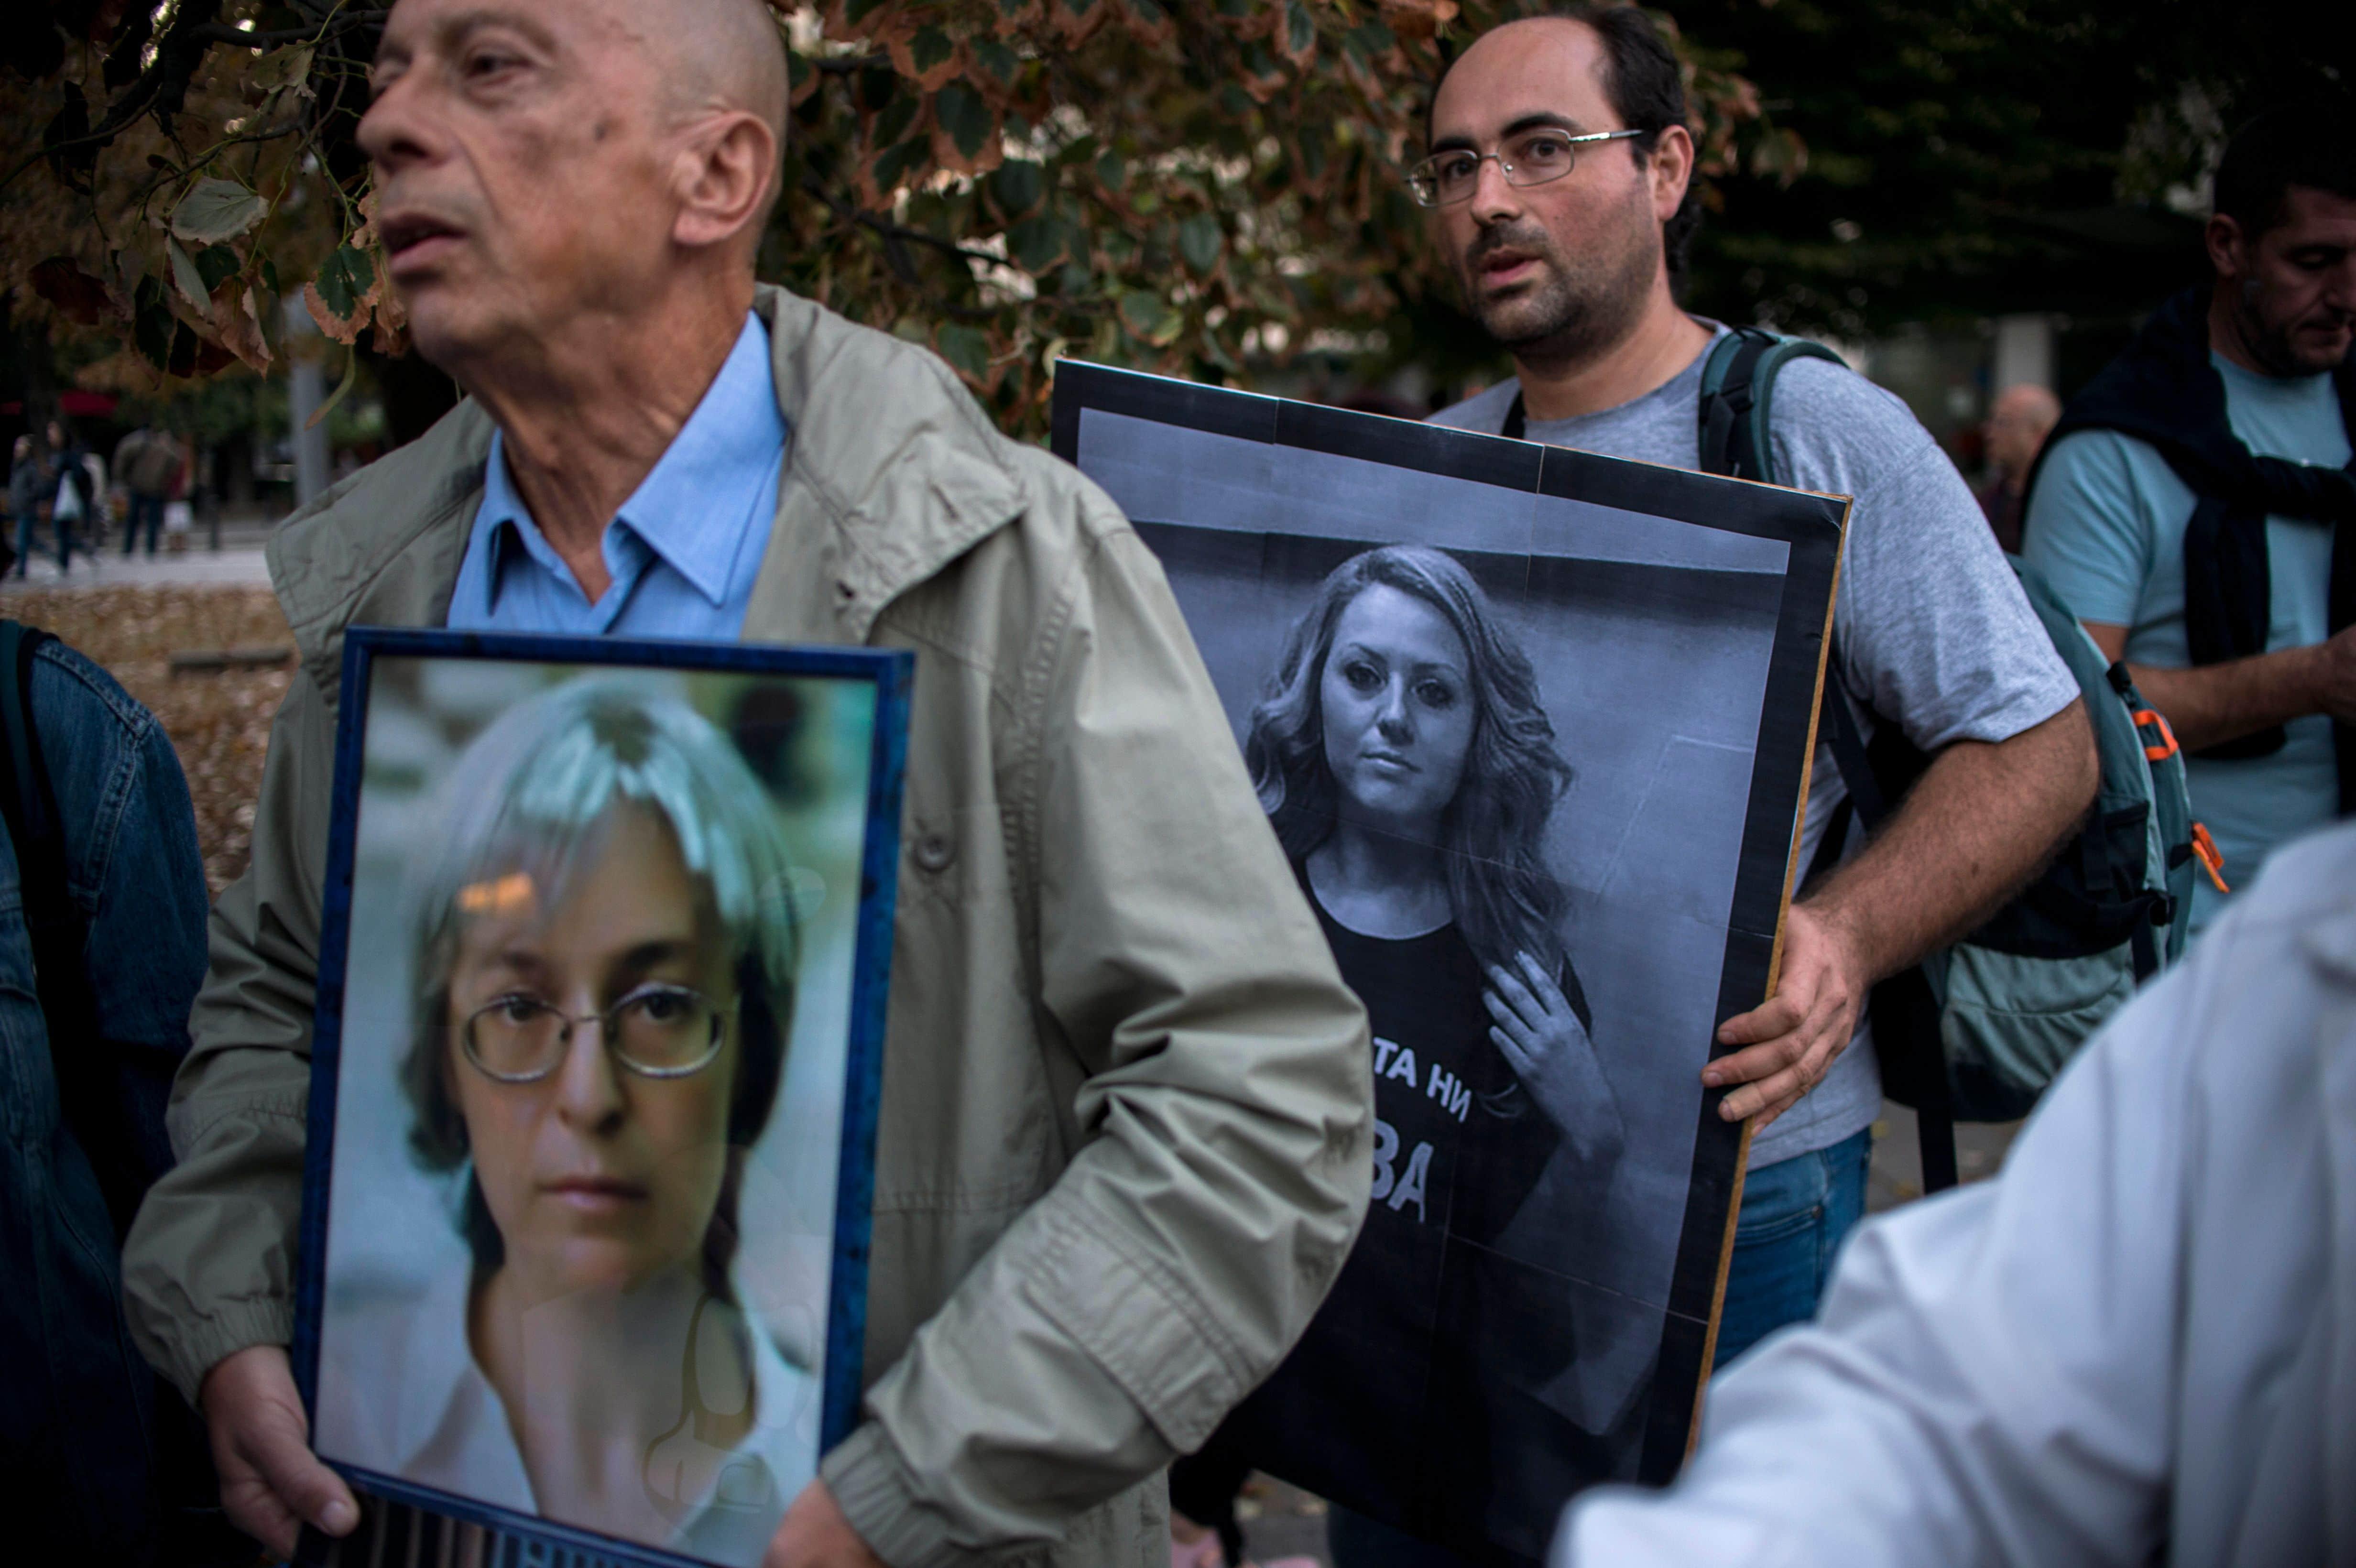 Two men hold pictures of murdered Bulgarian journalist Viktoria Marinova (C) and murdered Russian journalist Anna Politkovskaya (L), during a vigil in Sofia, Bulgaria, 8 October 2018, NIKOLAY DOYCHINOV/AFP/Getty Images